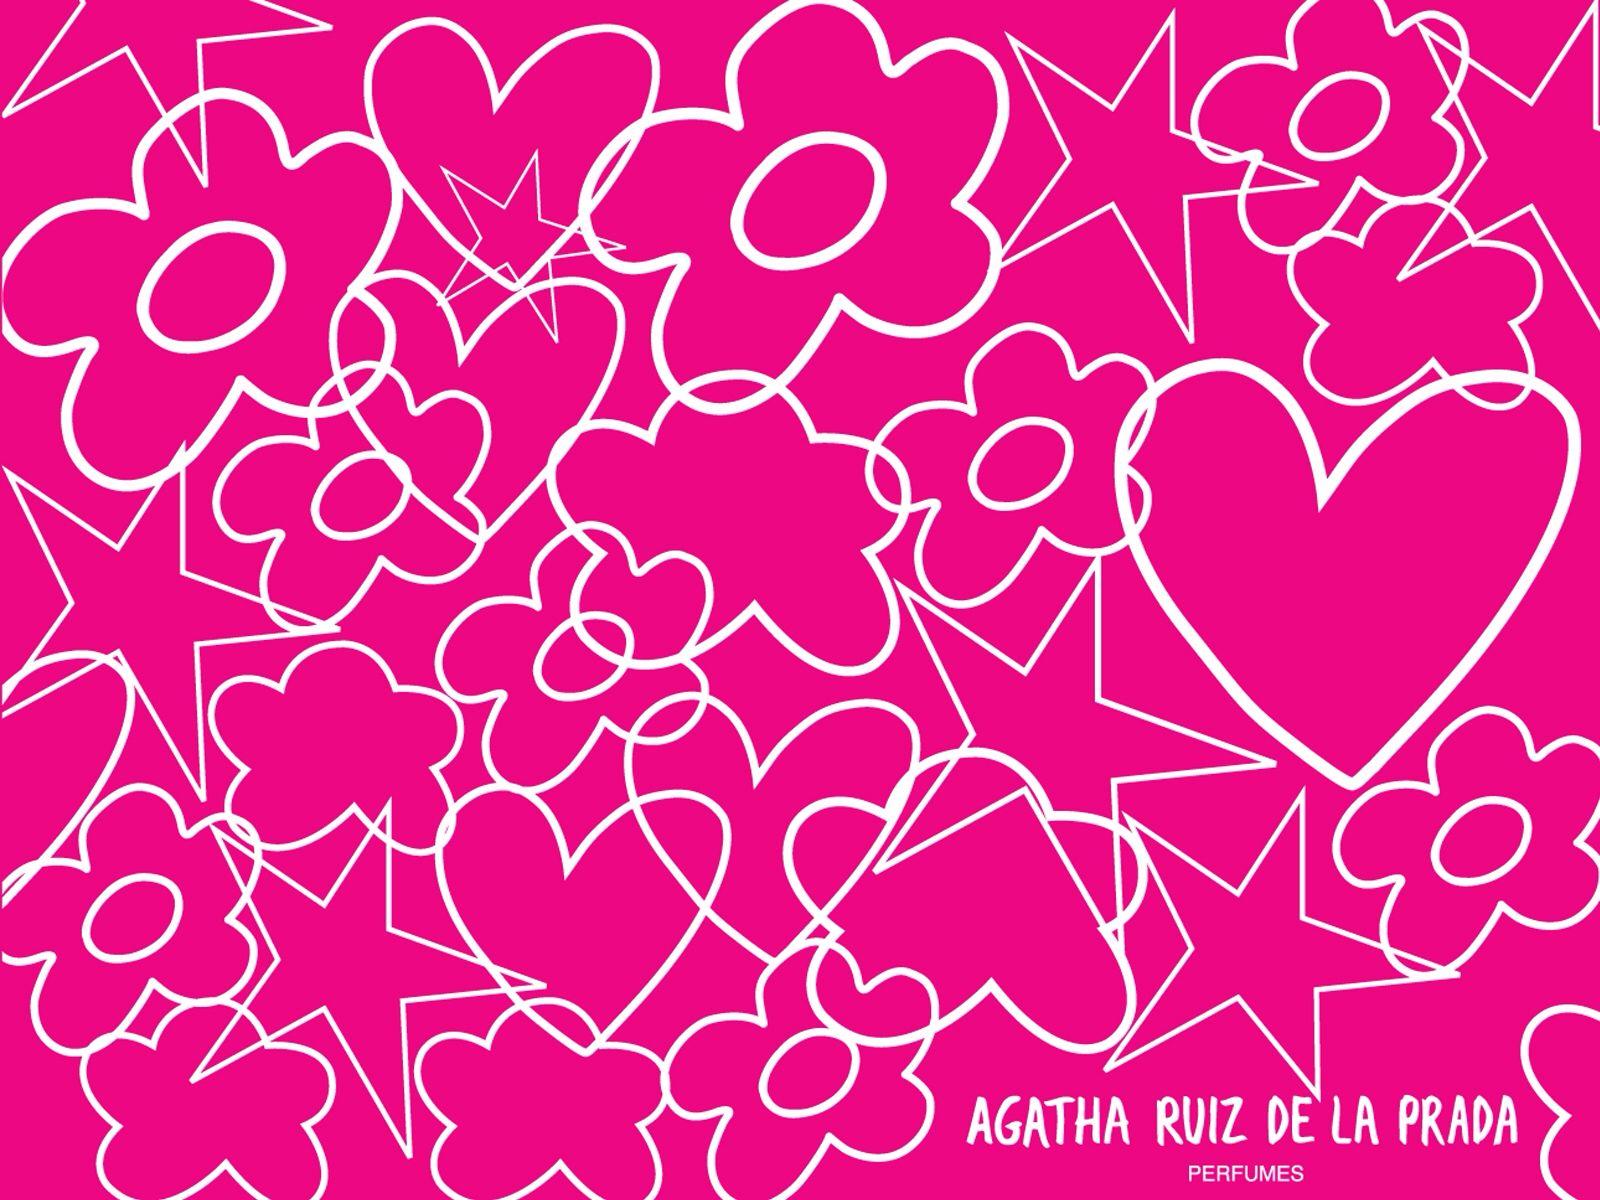 Pin De Carolina Quirosb En Vida Prada Ruiz Ilustraciones